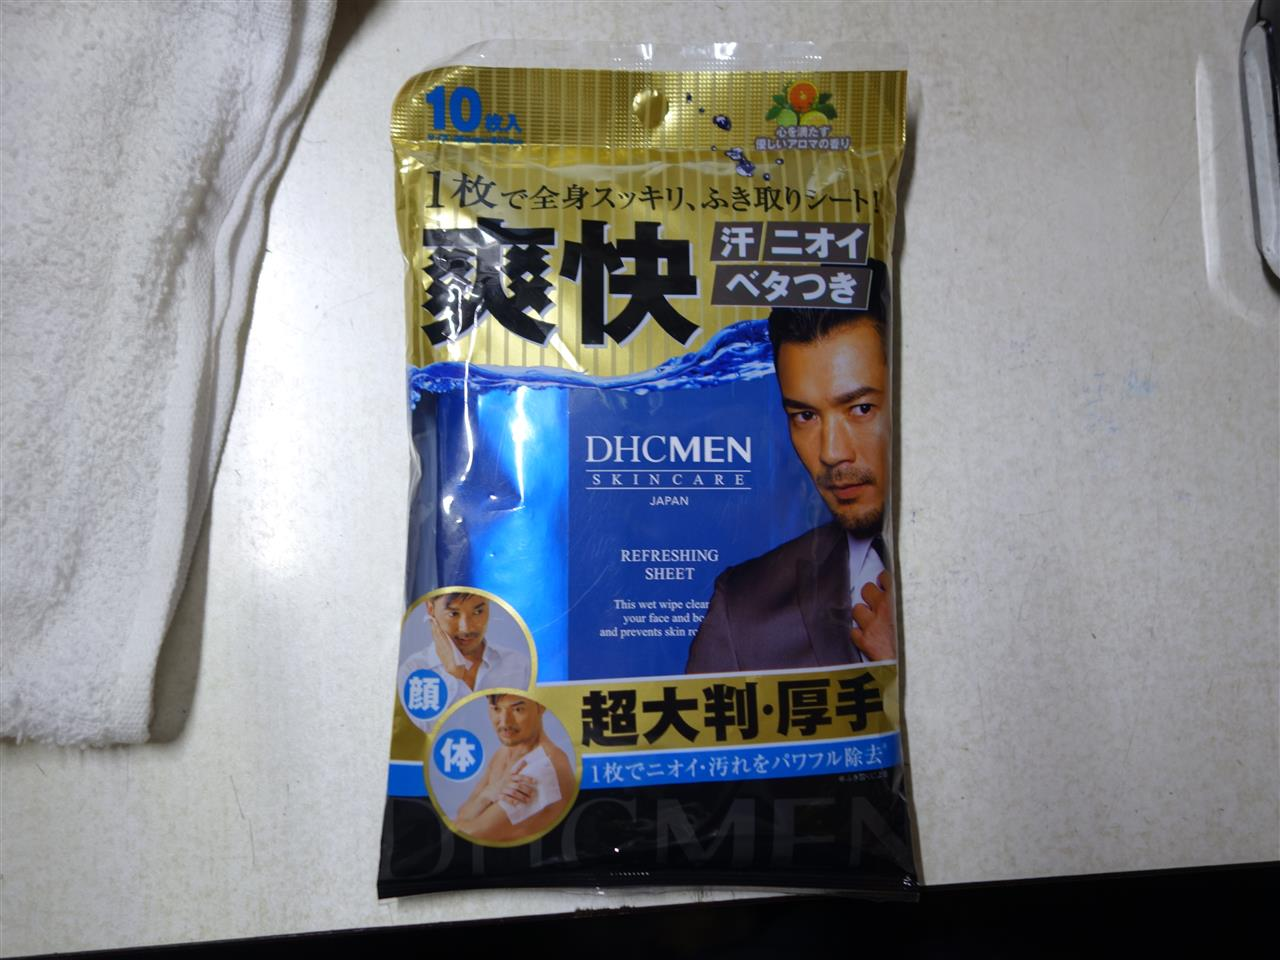 DHC MEN リフレッシングシート